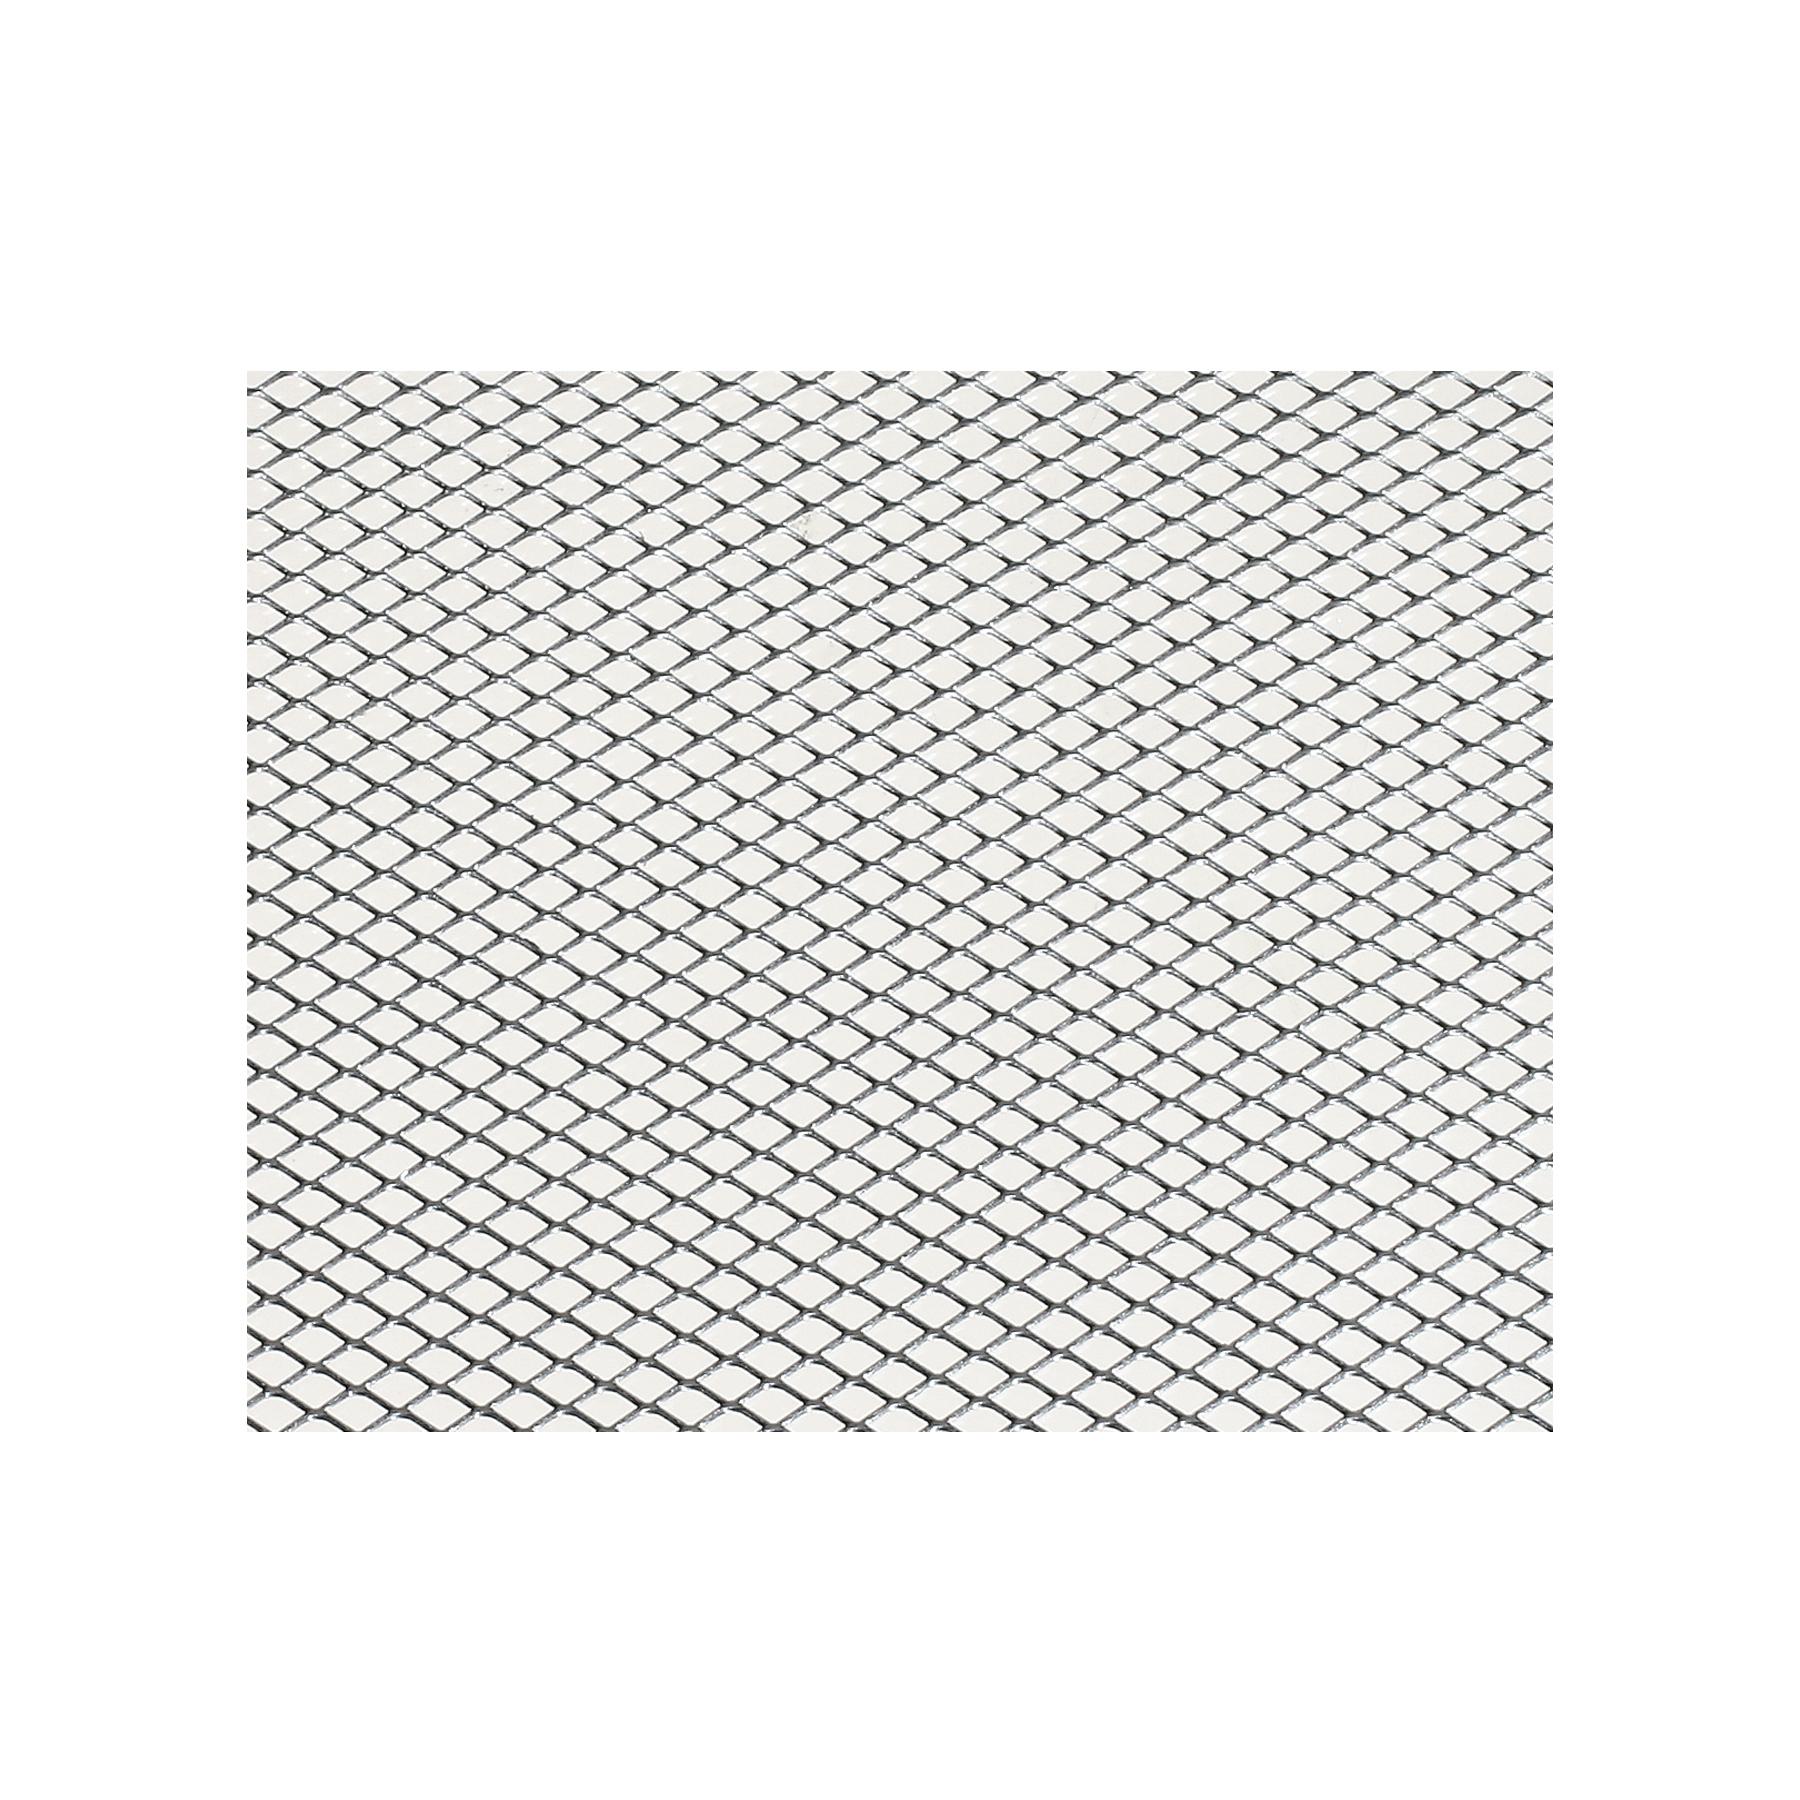 Chapa a o 500x400mm com furos 6x3 3mm expandida leroy merlin - Chapa aluminio leroy merlin ...